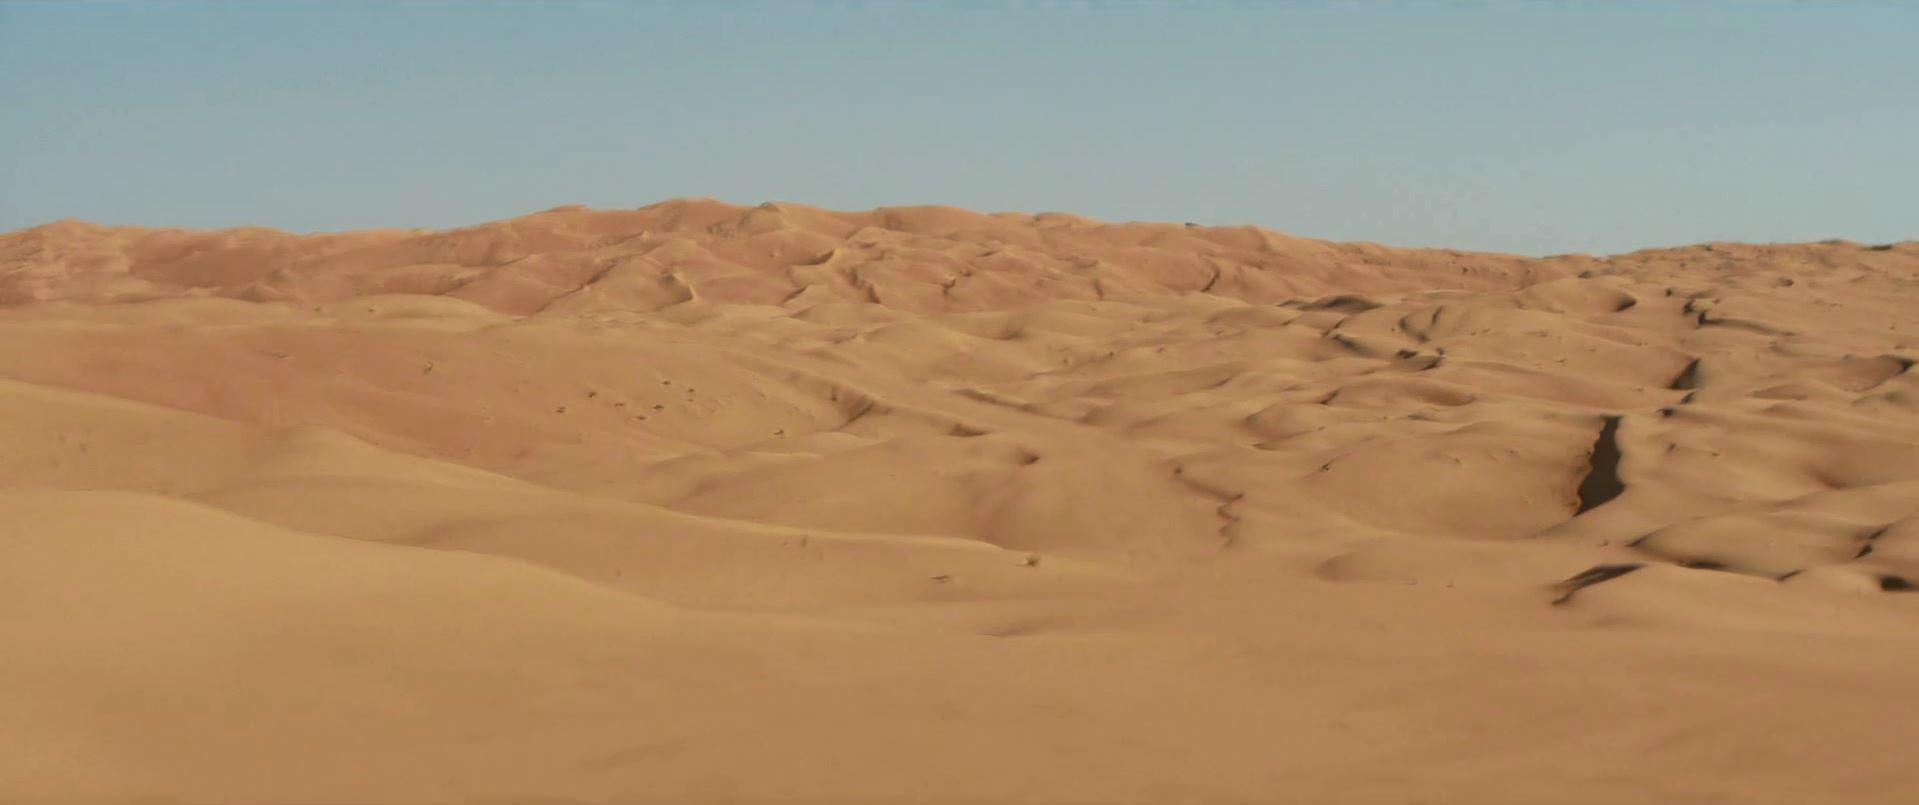 Tatooine episode 7 - Star Wars Episode 7 trailer released